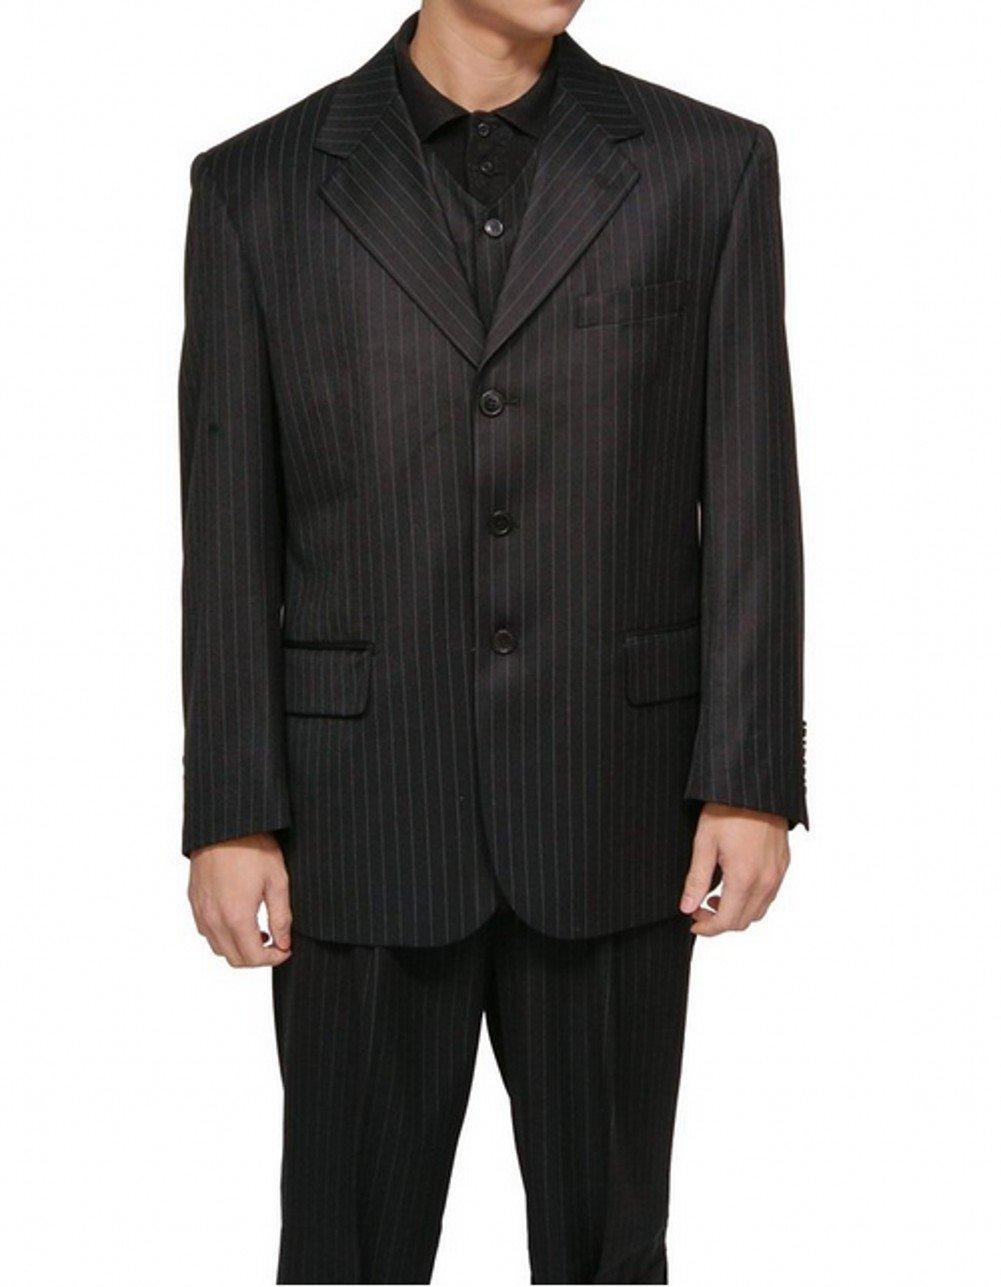 Love Dress Men's 3 Piece Black Gangster Pinstripe Dress Suit with Matching Vest 4XL